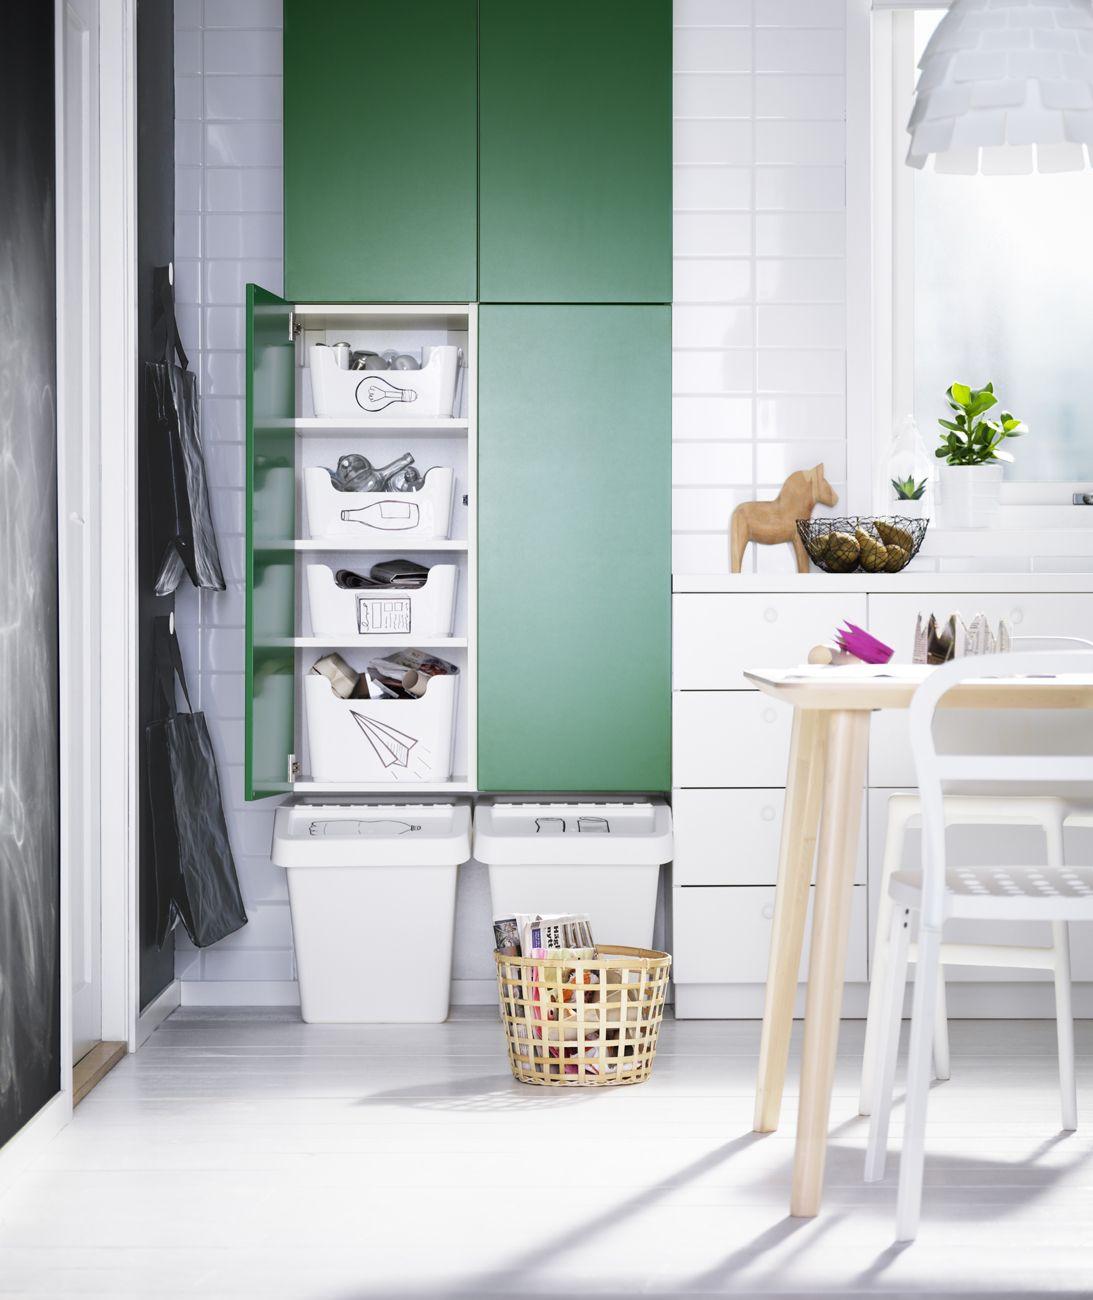 Cucine piccole: 30 idee per arredarle | Mono cucina Ikea ...